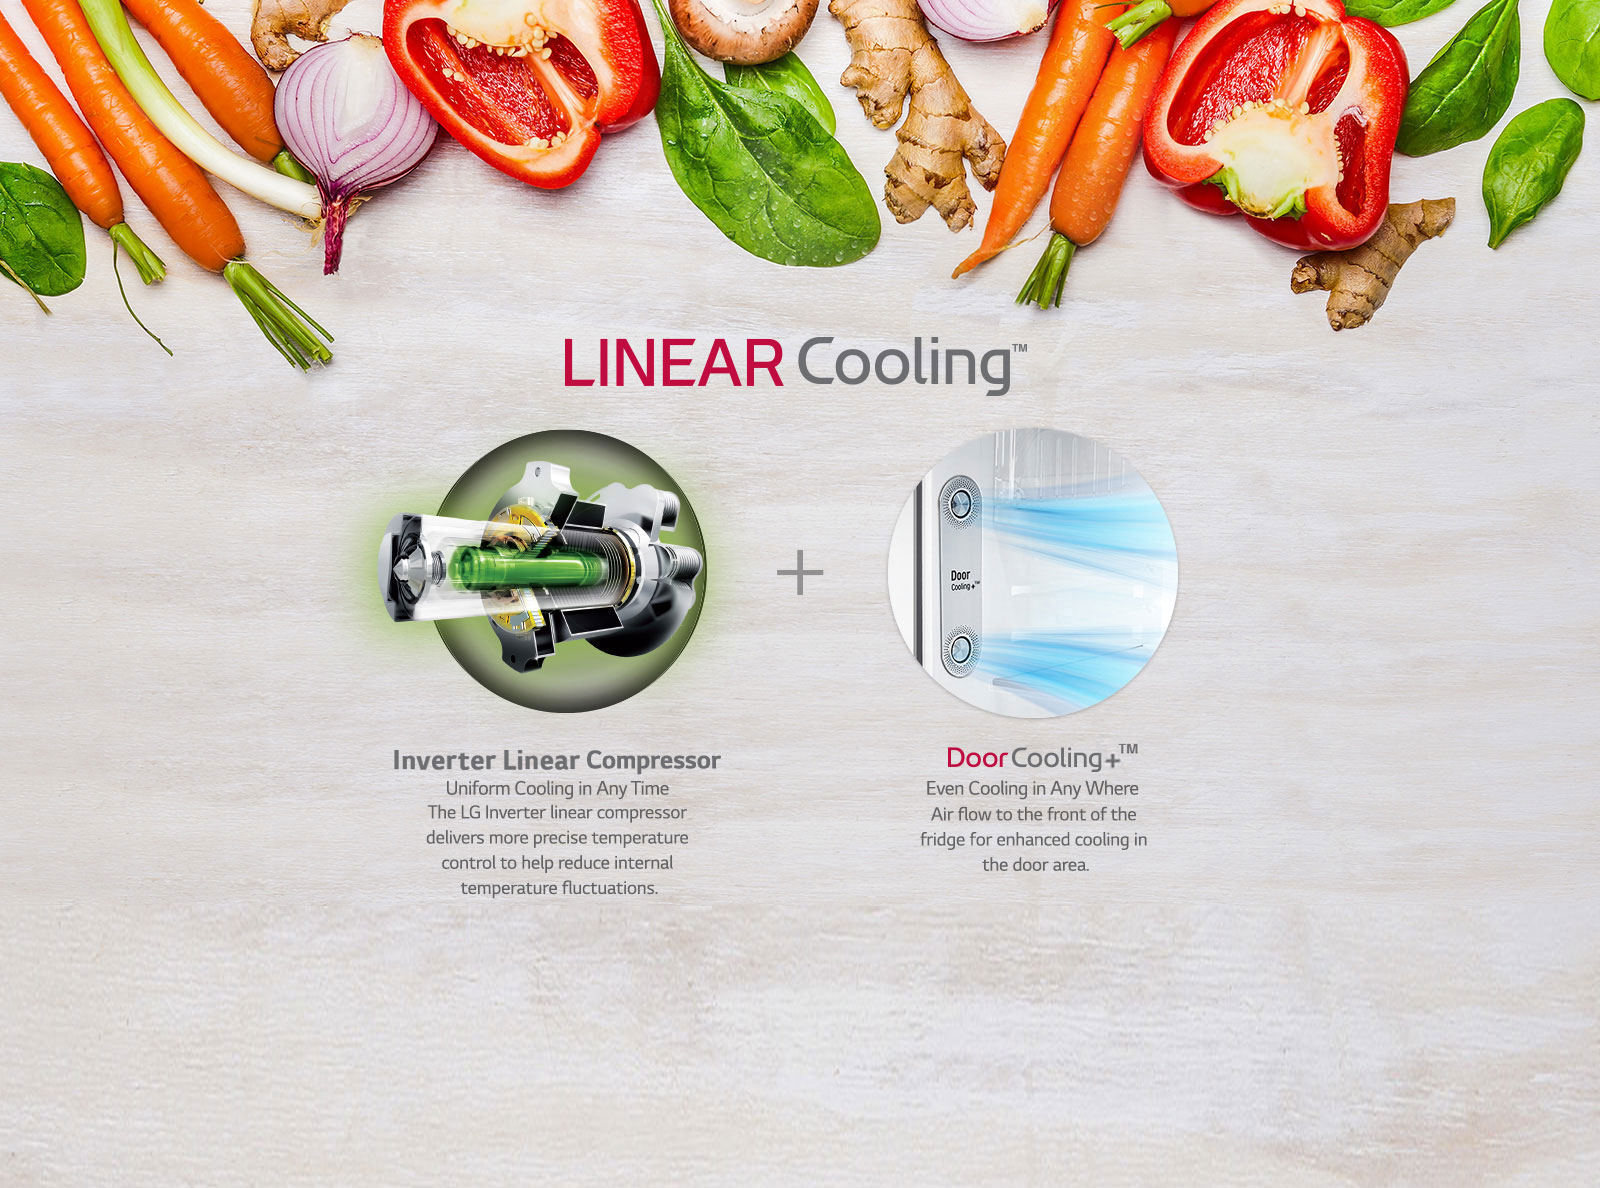 LG GL-T372JRS3 335 Ltr Linear Cooling